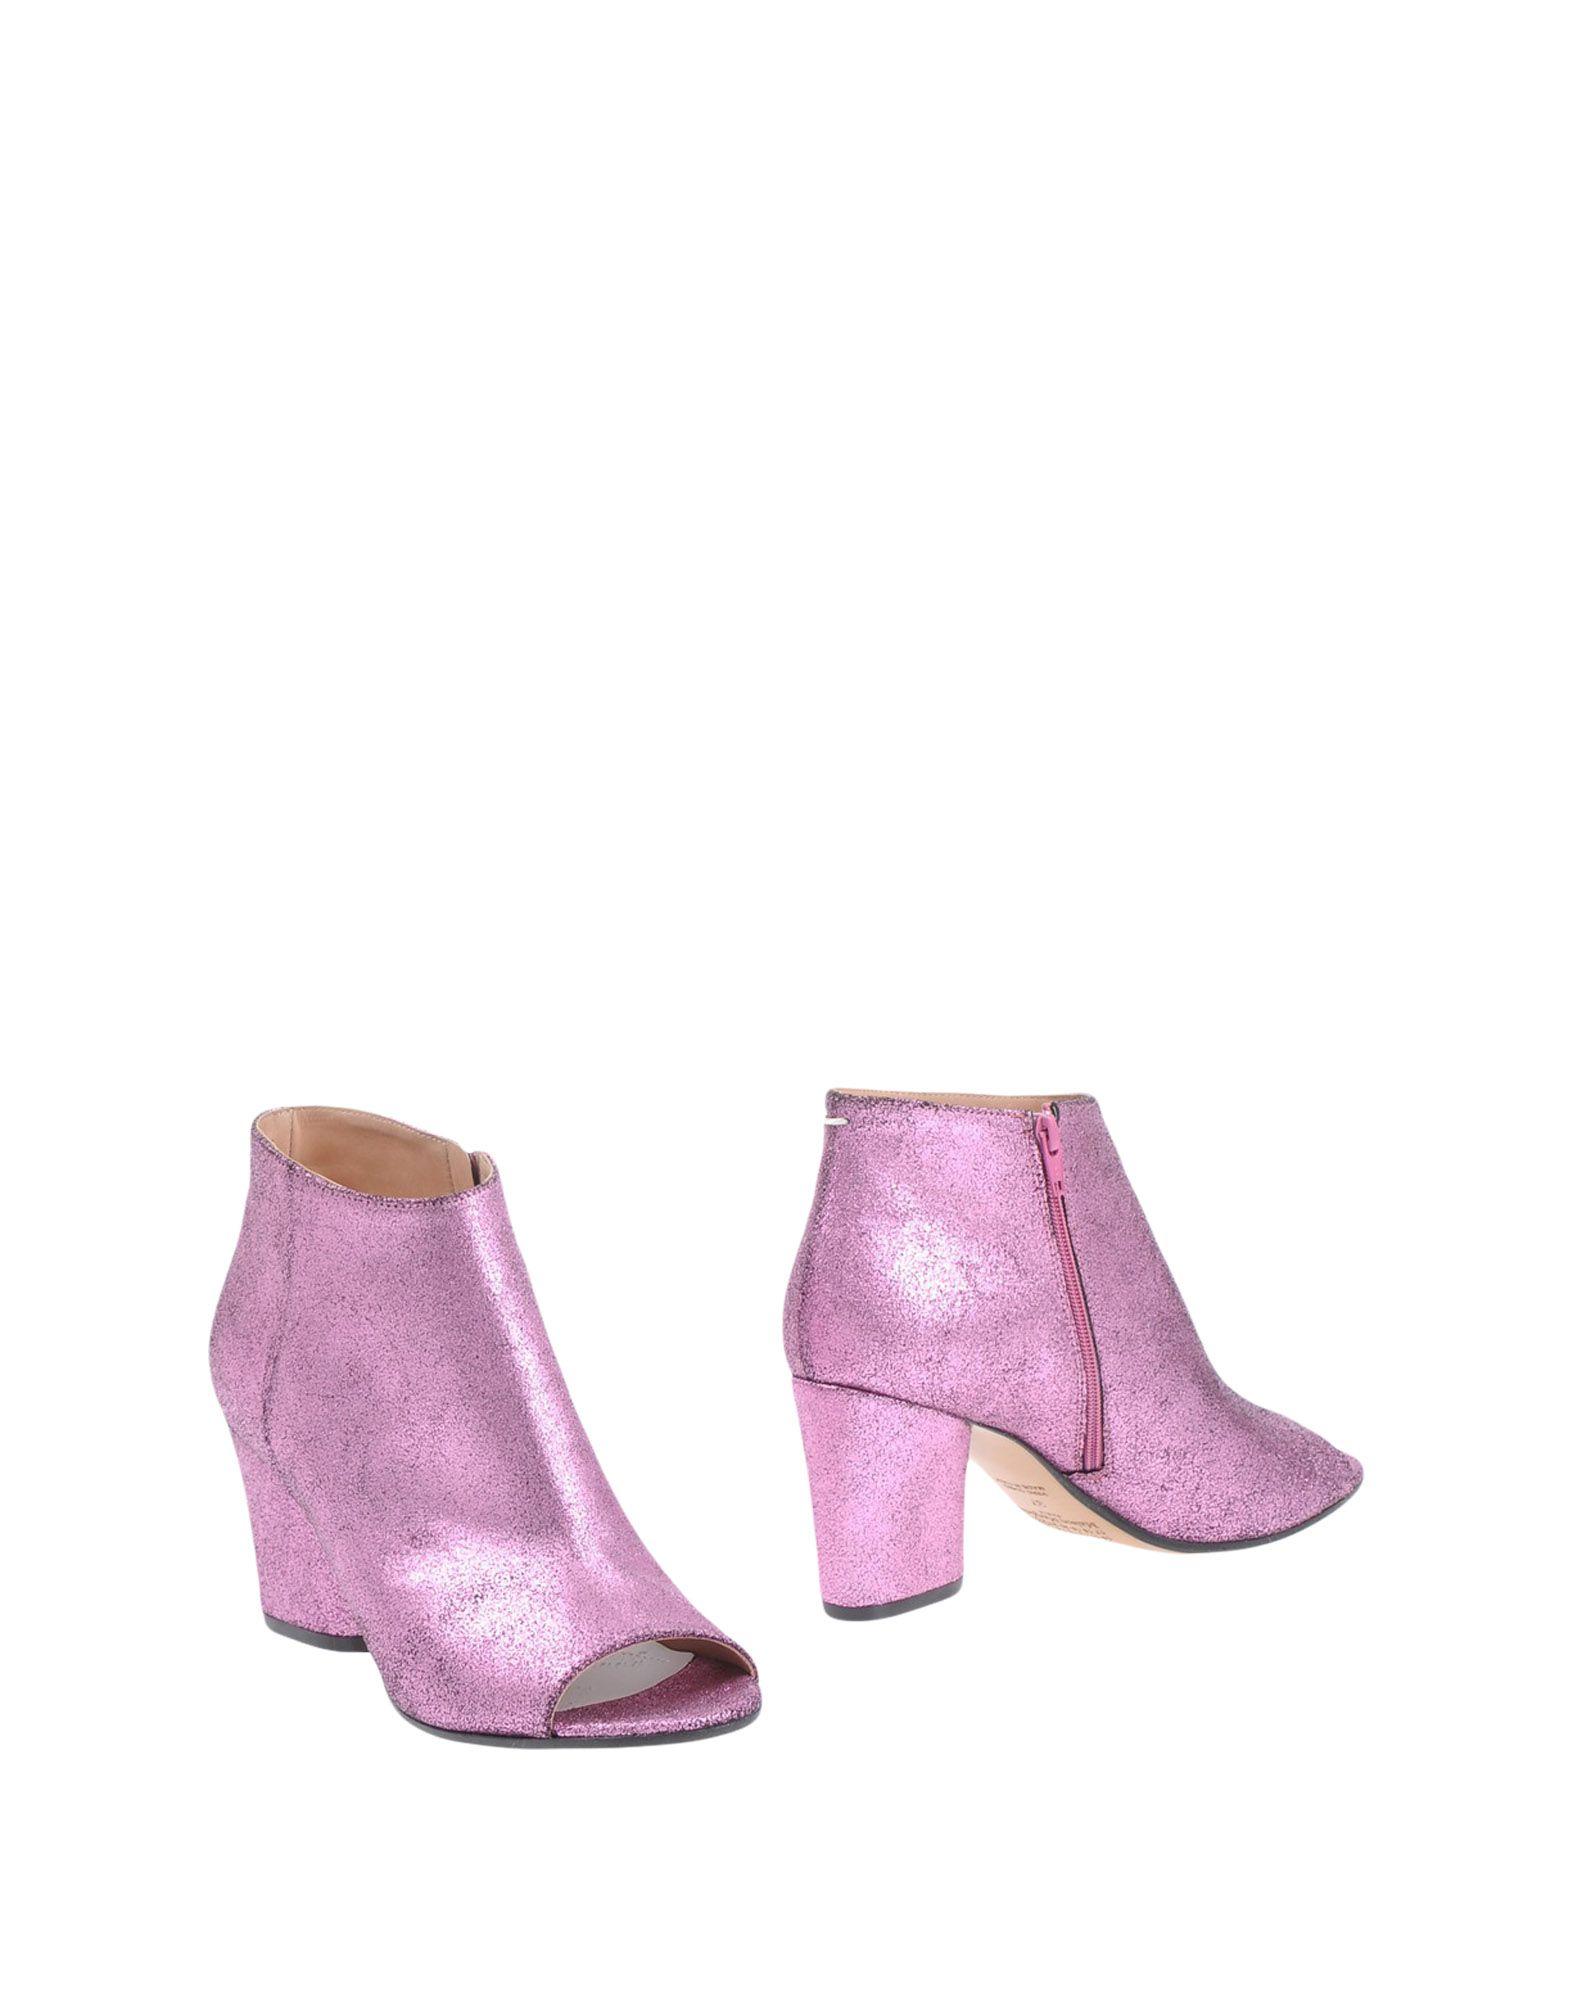 Stilvolle billige Schuhe Maison 11341020WF Margiela Stiefelette Damen  11341020WF Maison 7415dc